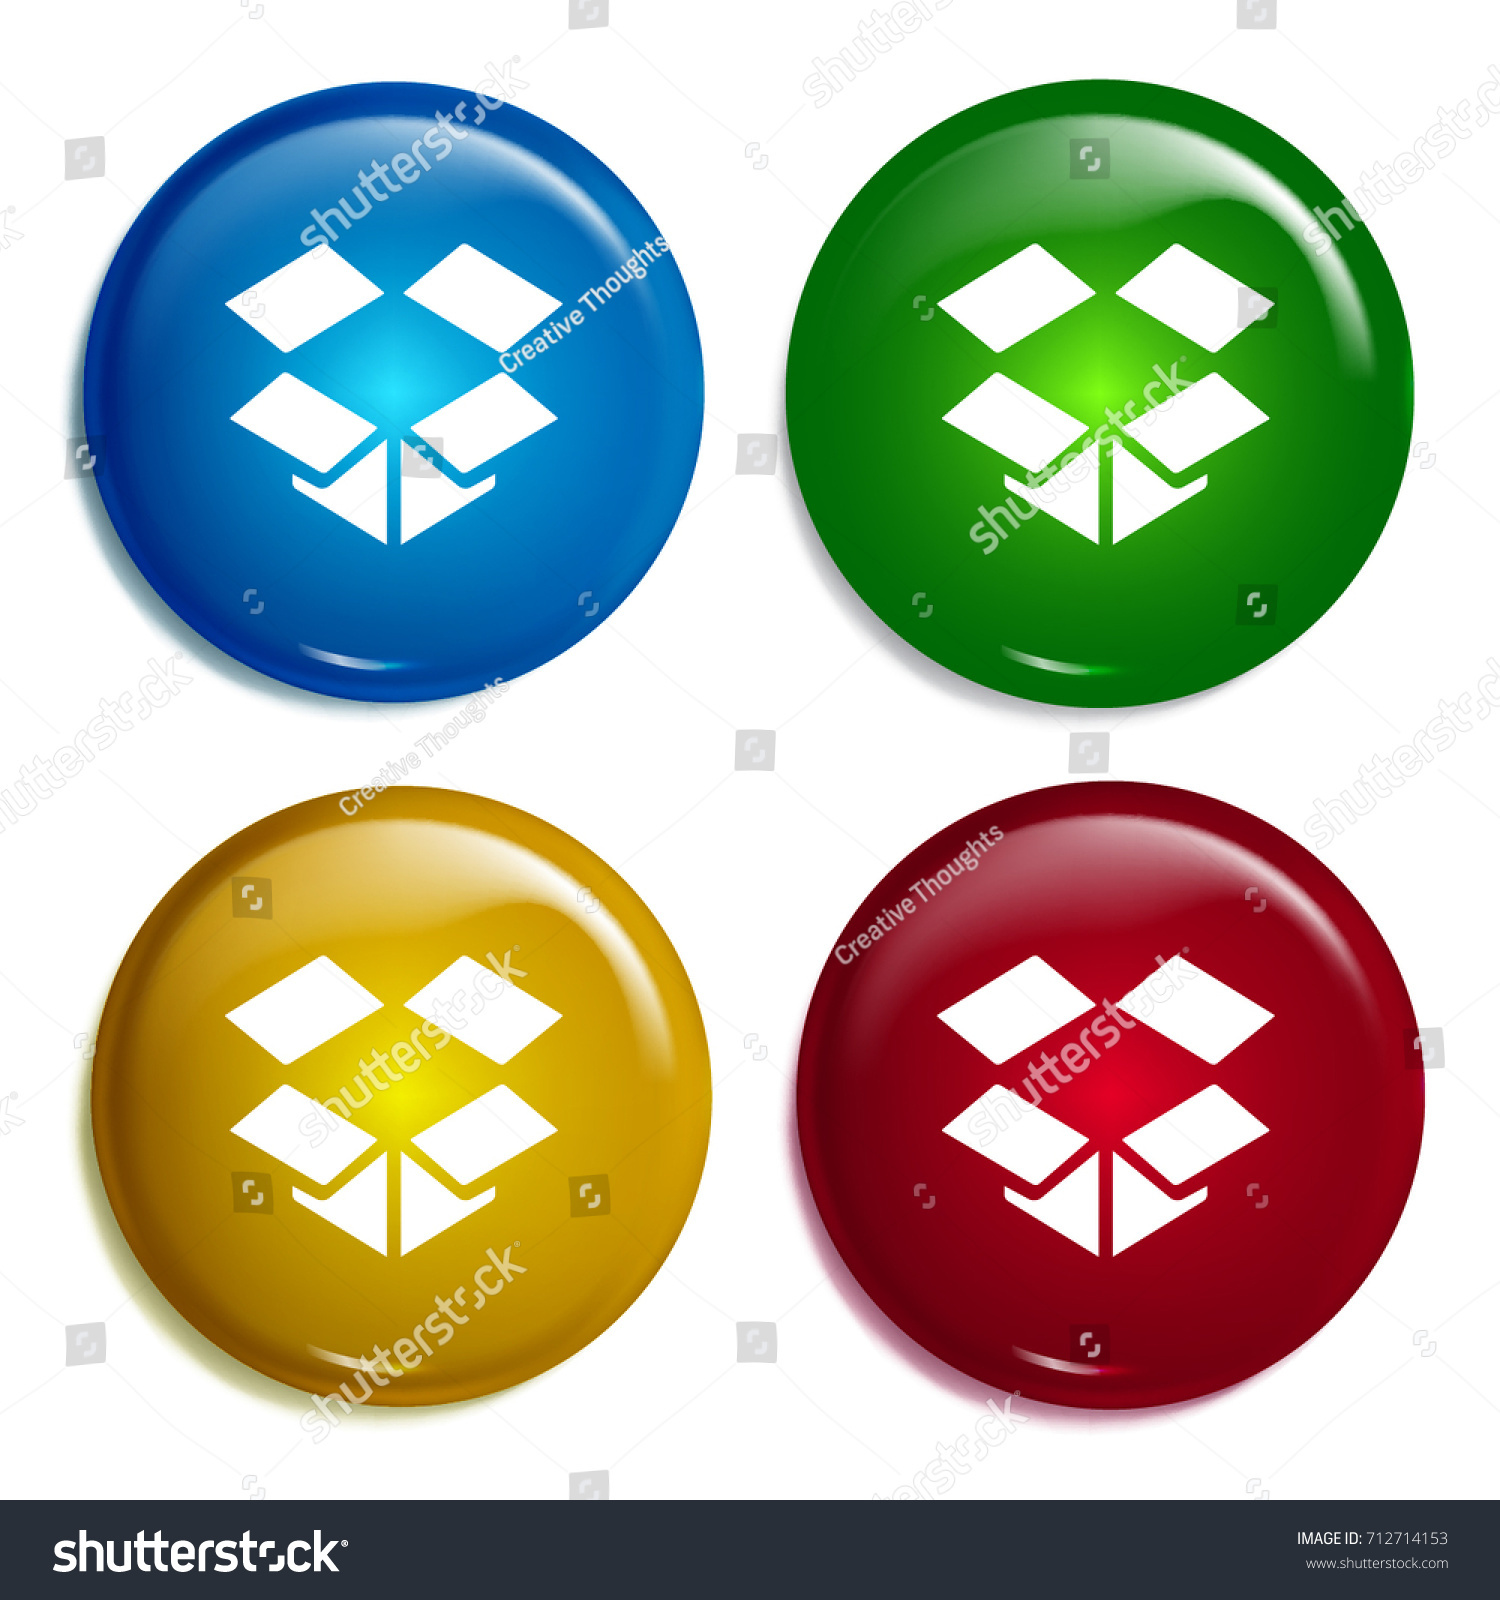 Dropbox multi color gradient glossy badge stock vector 712714153 dropbox multi color gradient glossy badge icon set realistic shiny badge icon or logo mockup biocorpaavc Gallery